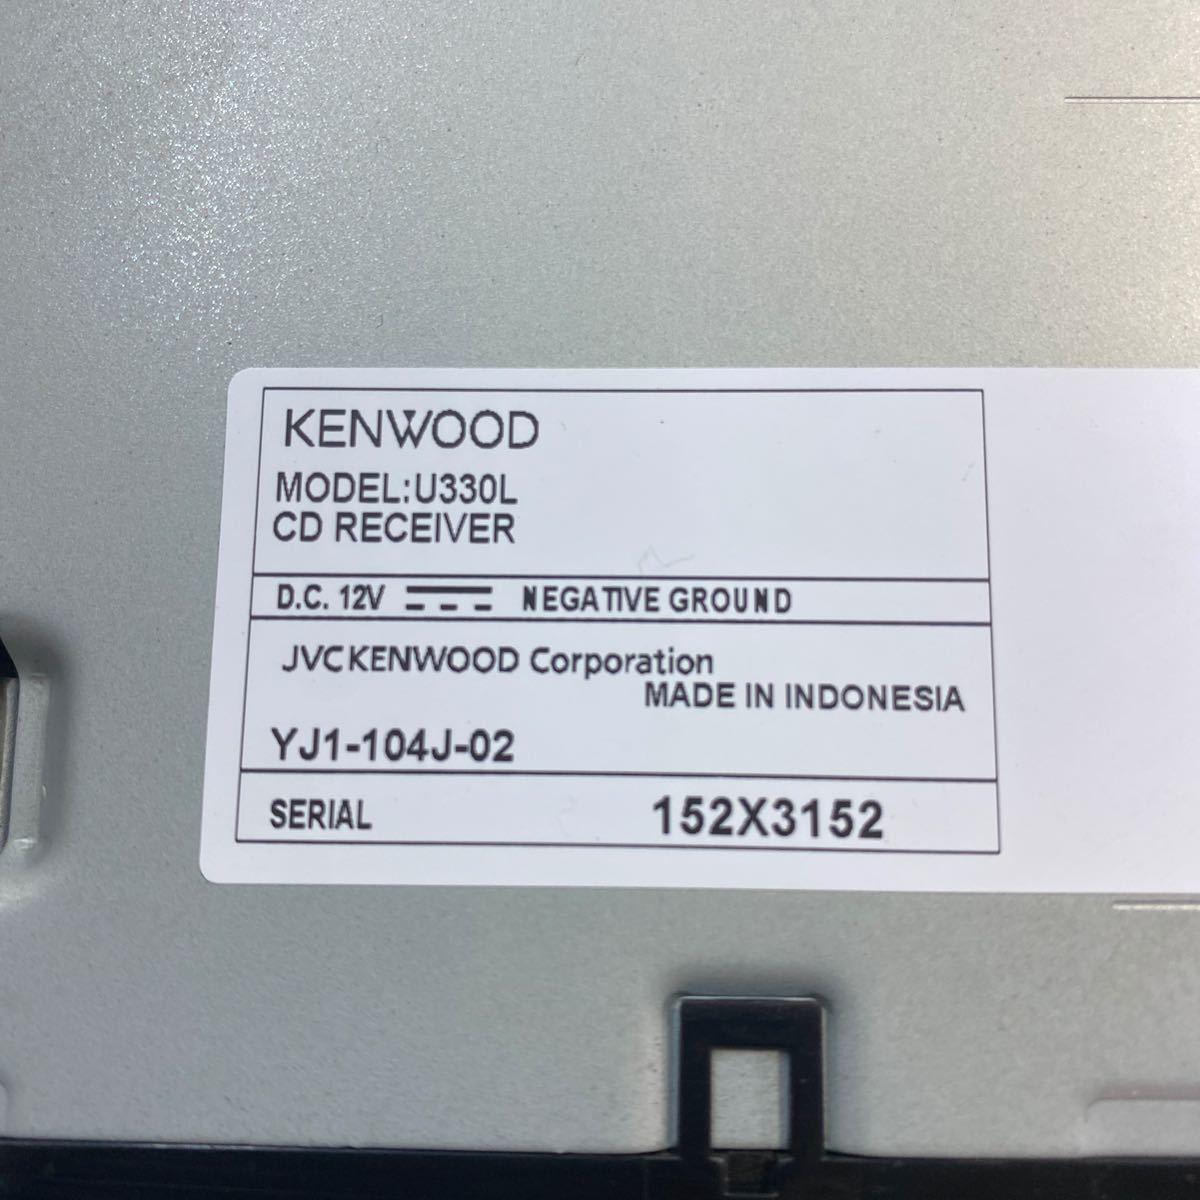 No.961KENWOOD U330L CDプレーヤー 1DIN USB AUX ケンウッド _画像4